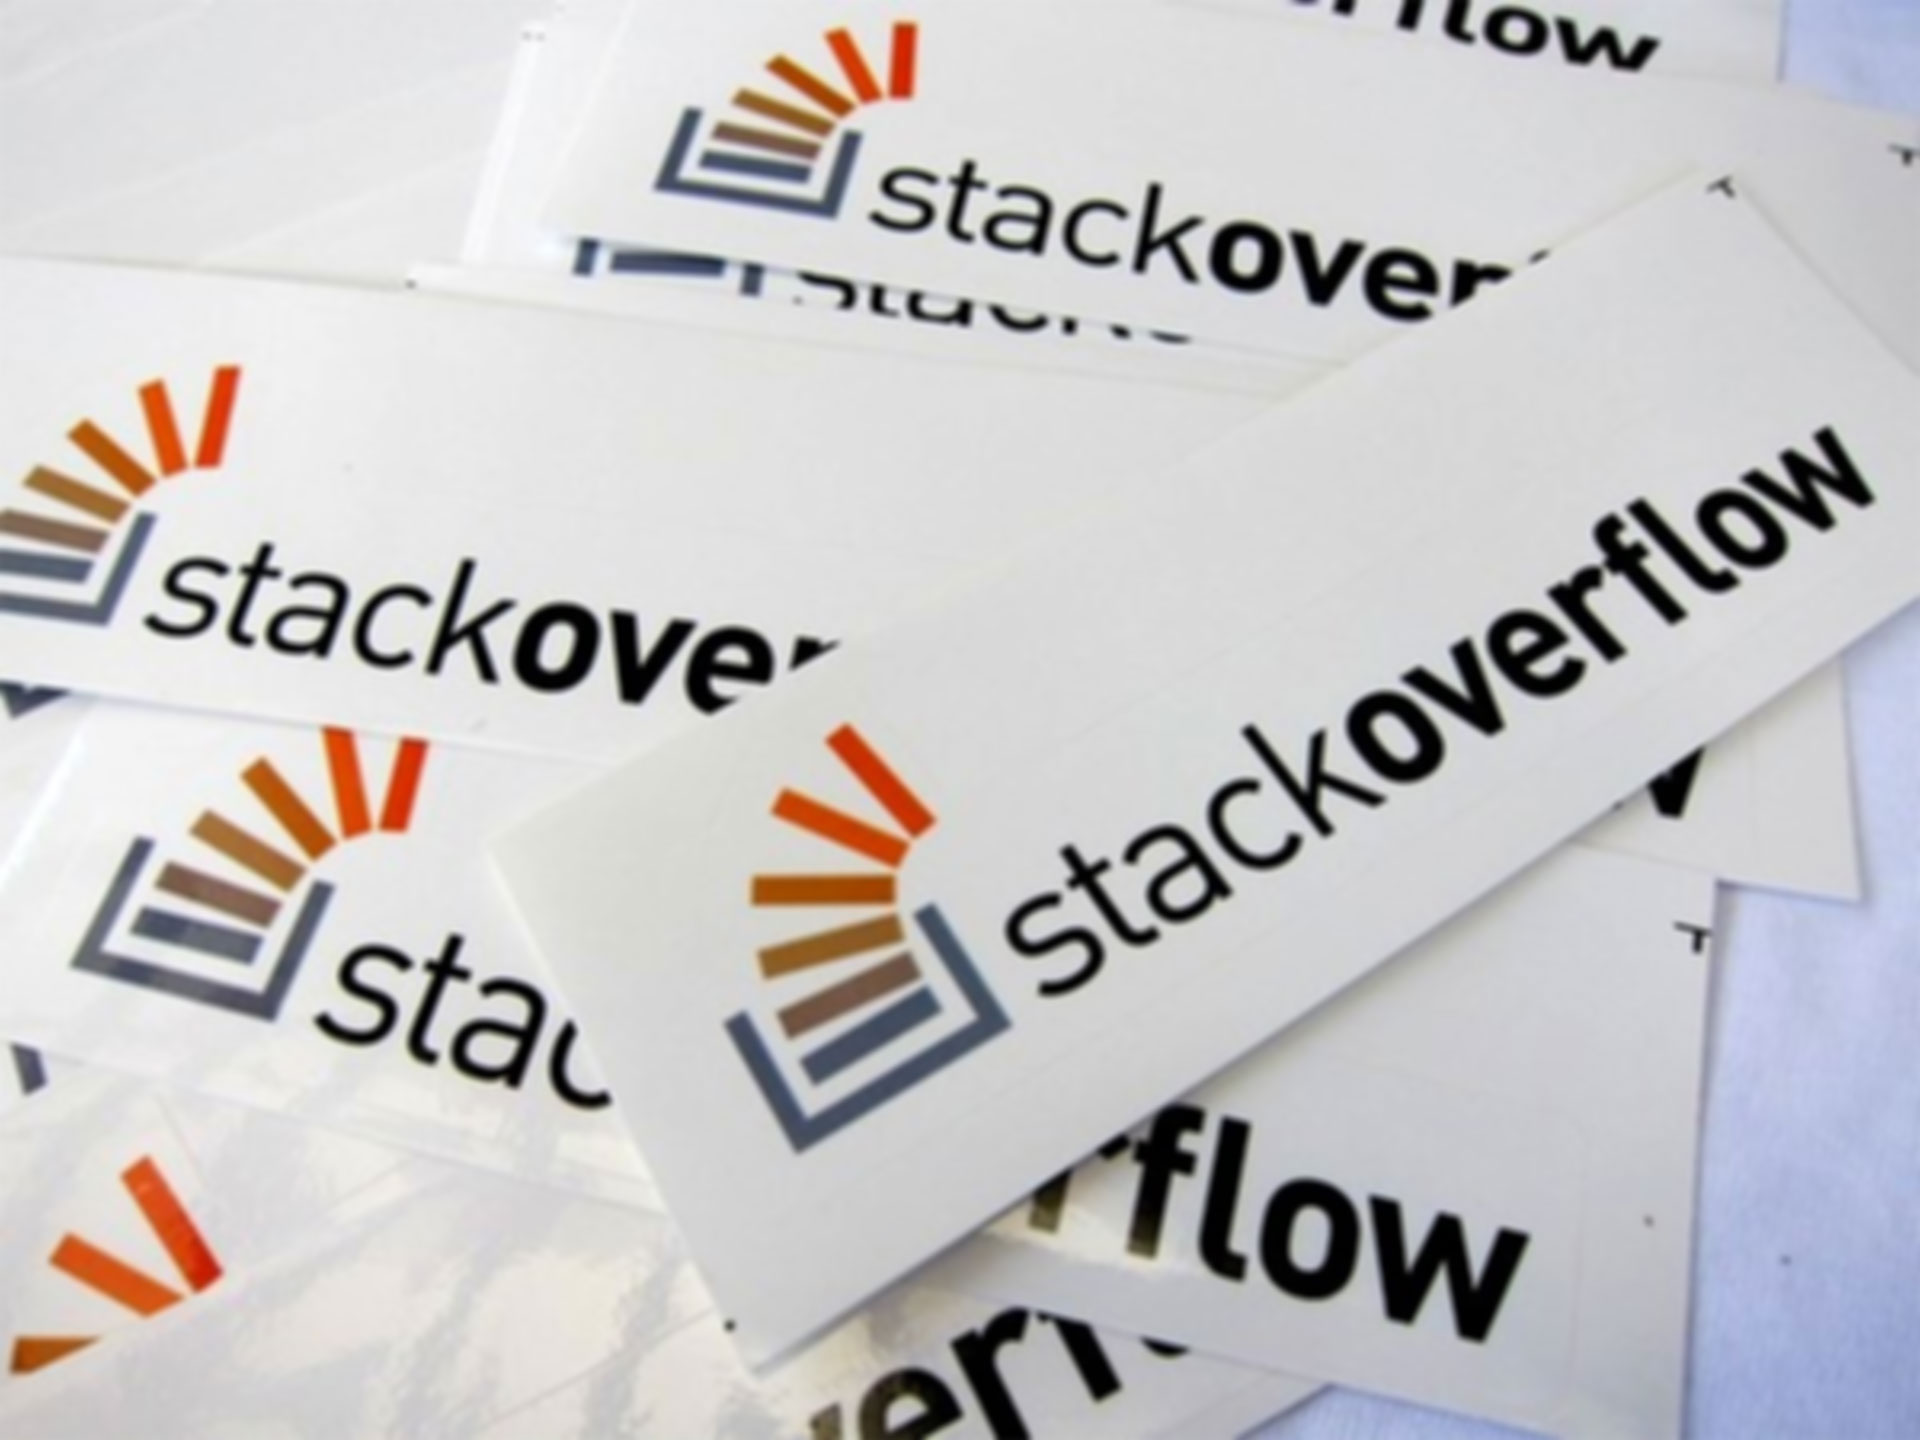 stackoverflow2